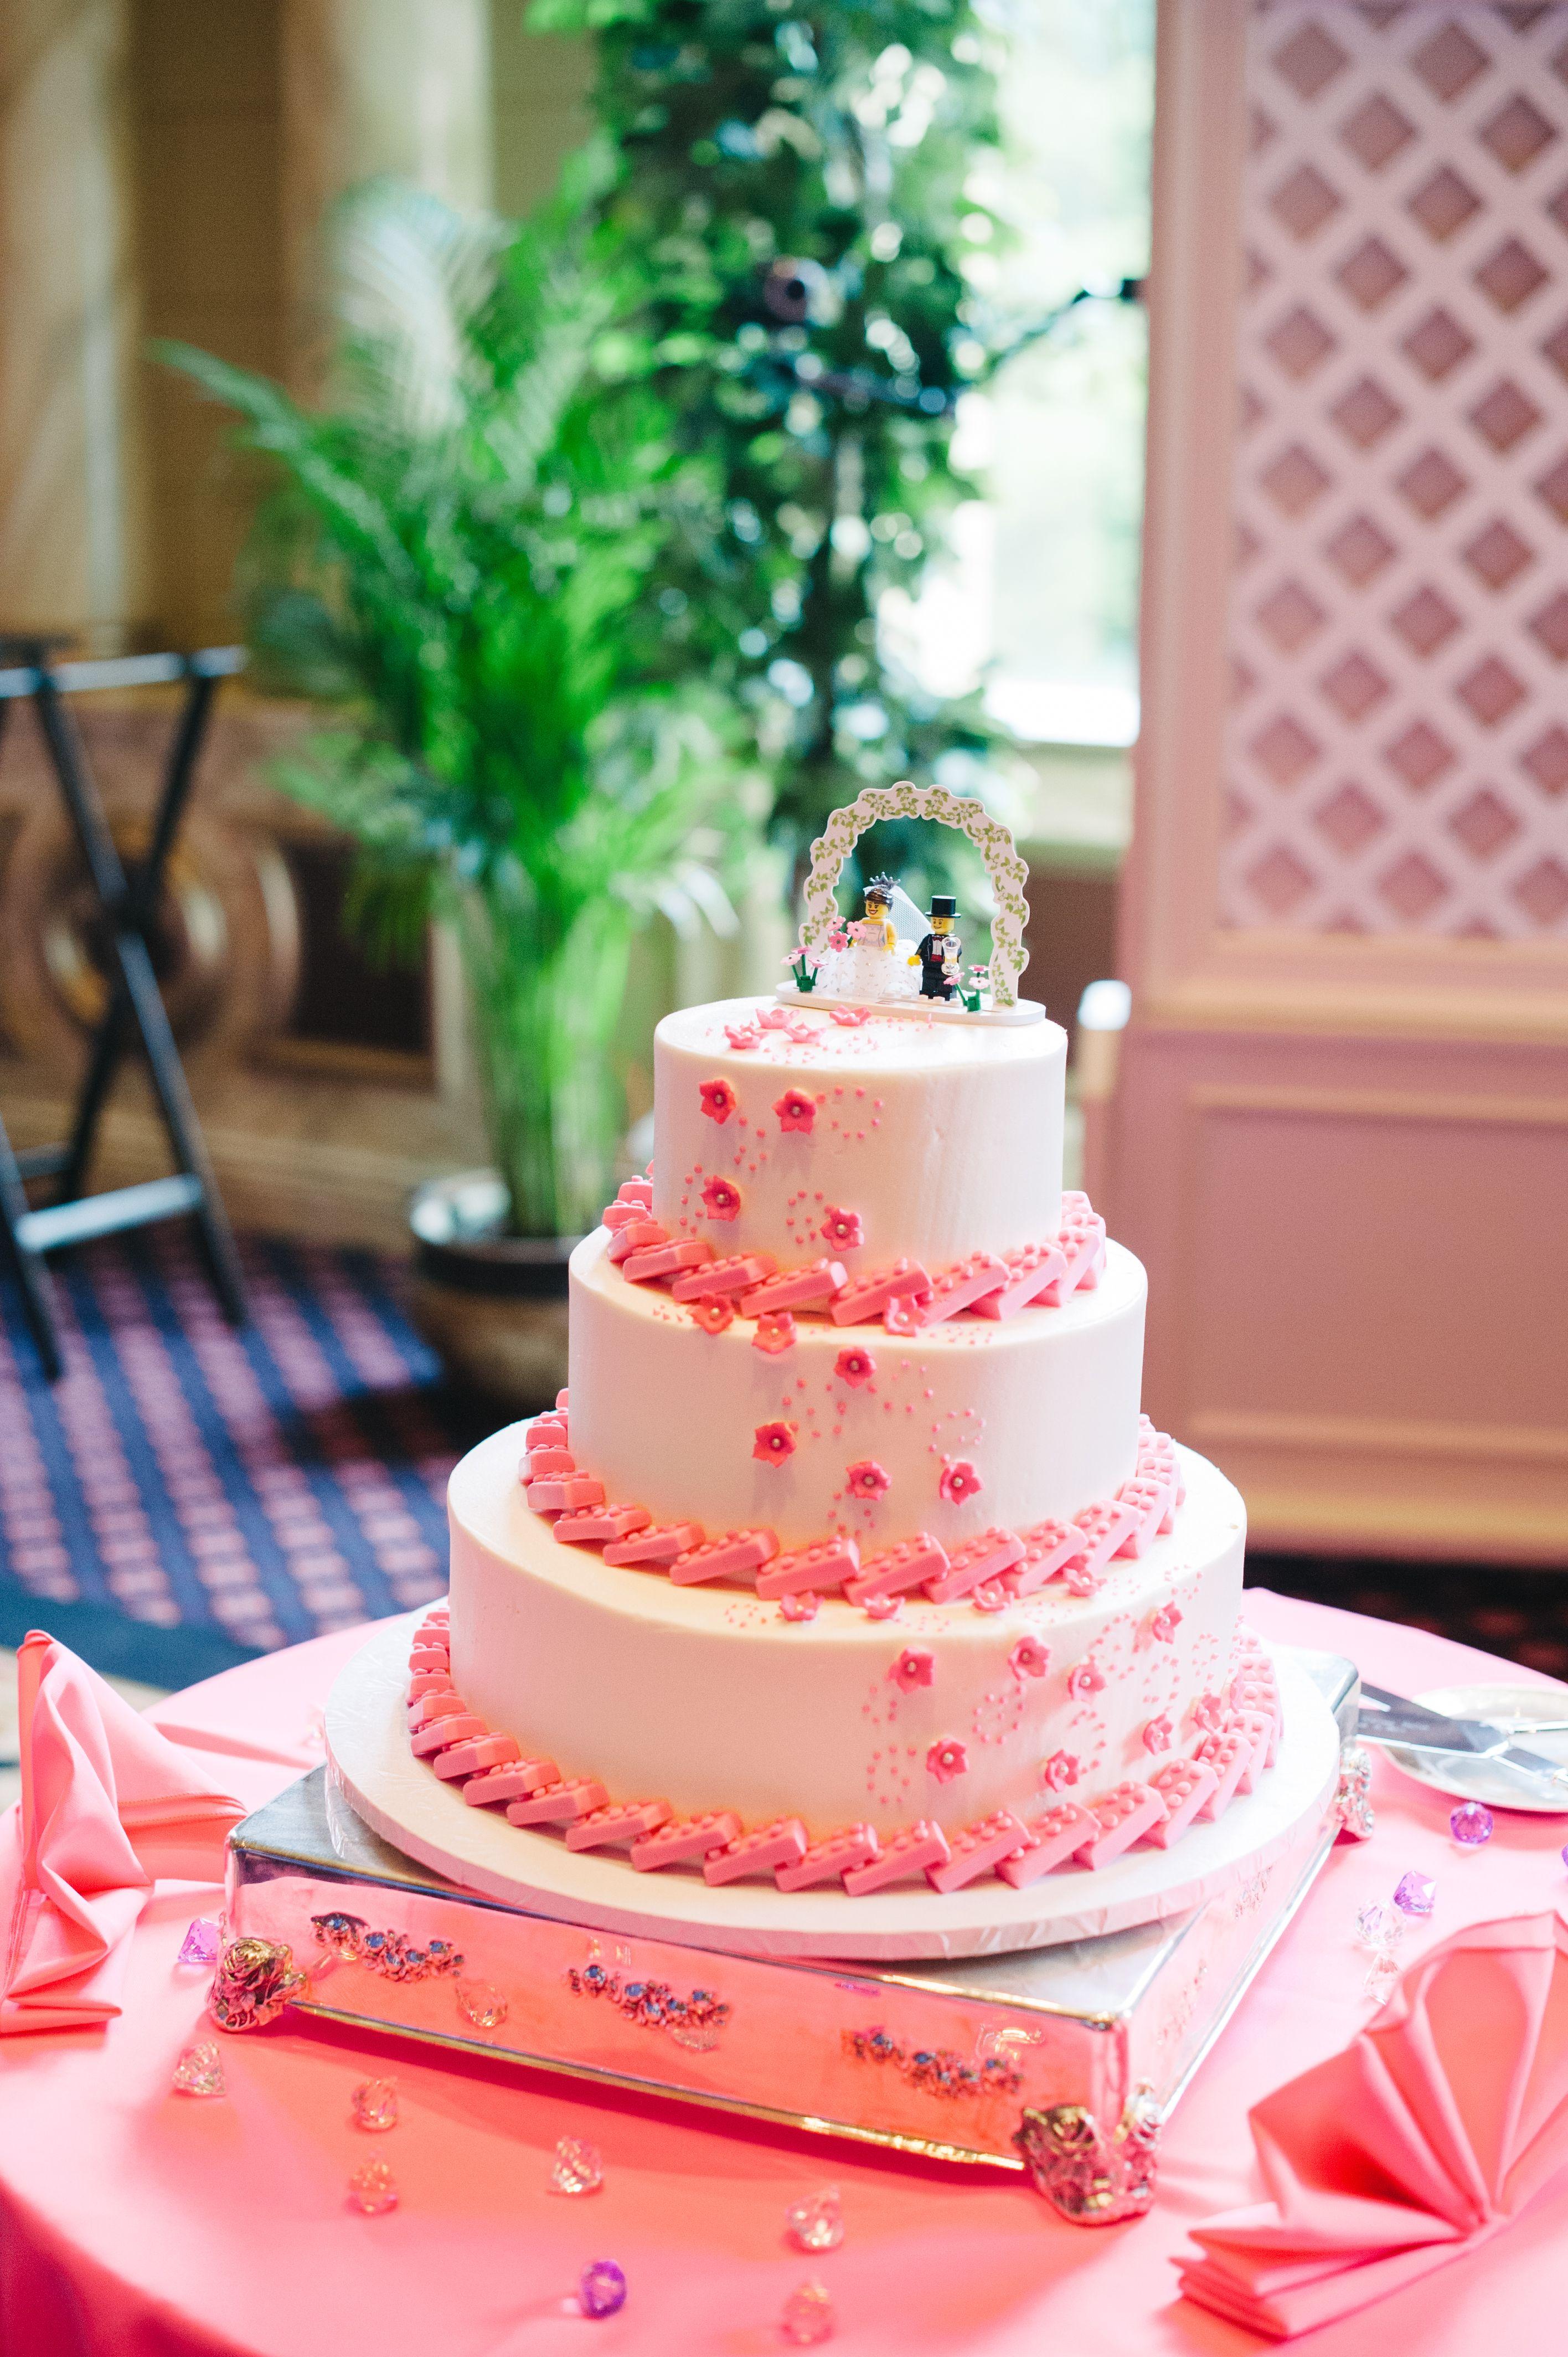 Custom Pink Lego Wedding Cake from Bakery Express/Ms. Desserts Pink ...